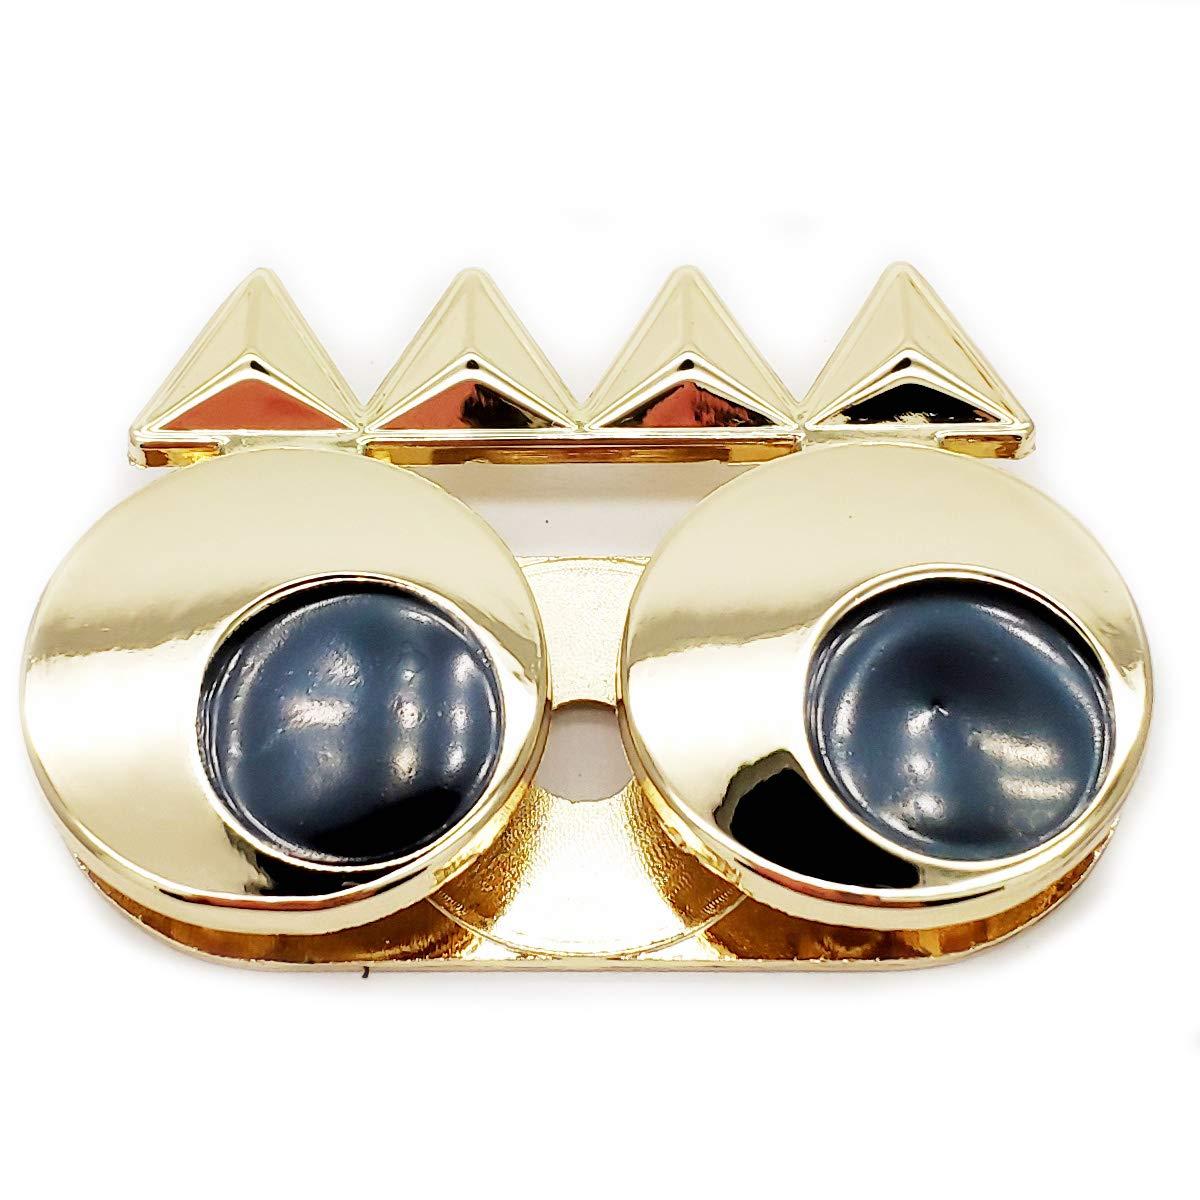 2 Sets Gold Tone Purse Magnetic Lock Metal Eyes Shape Lock 2x1inch TB-0633